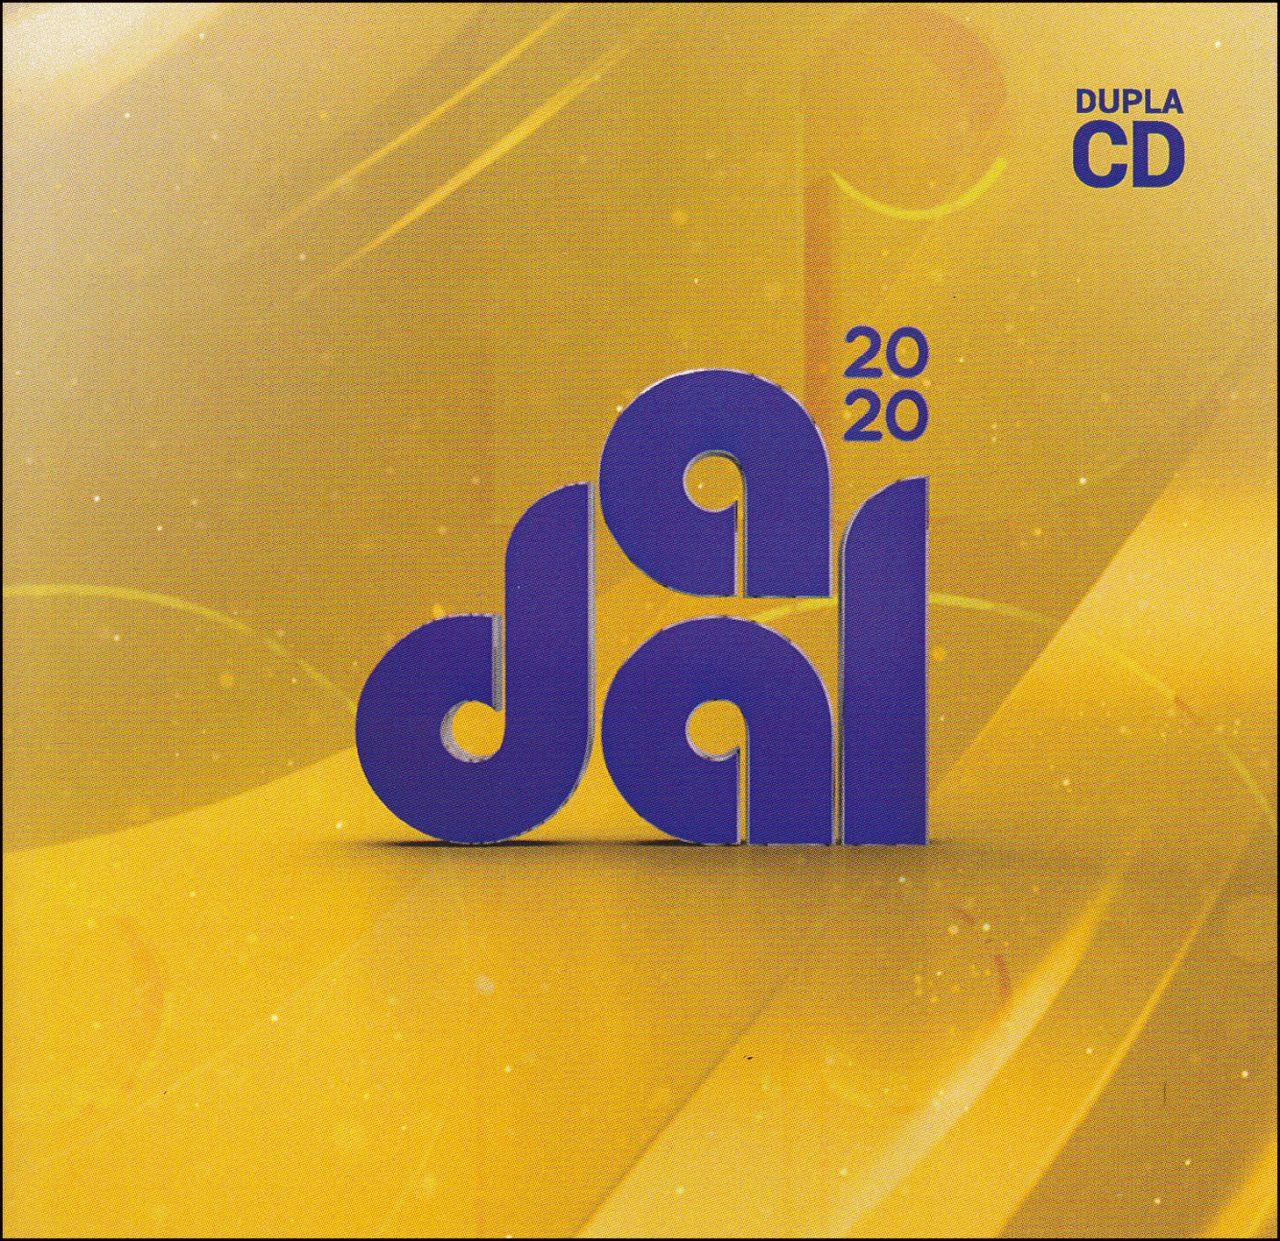 A Dal 2020 (dupla CD) (CD)